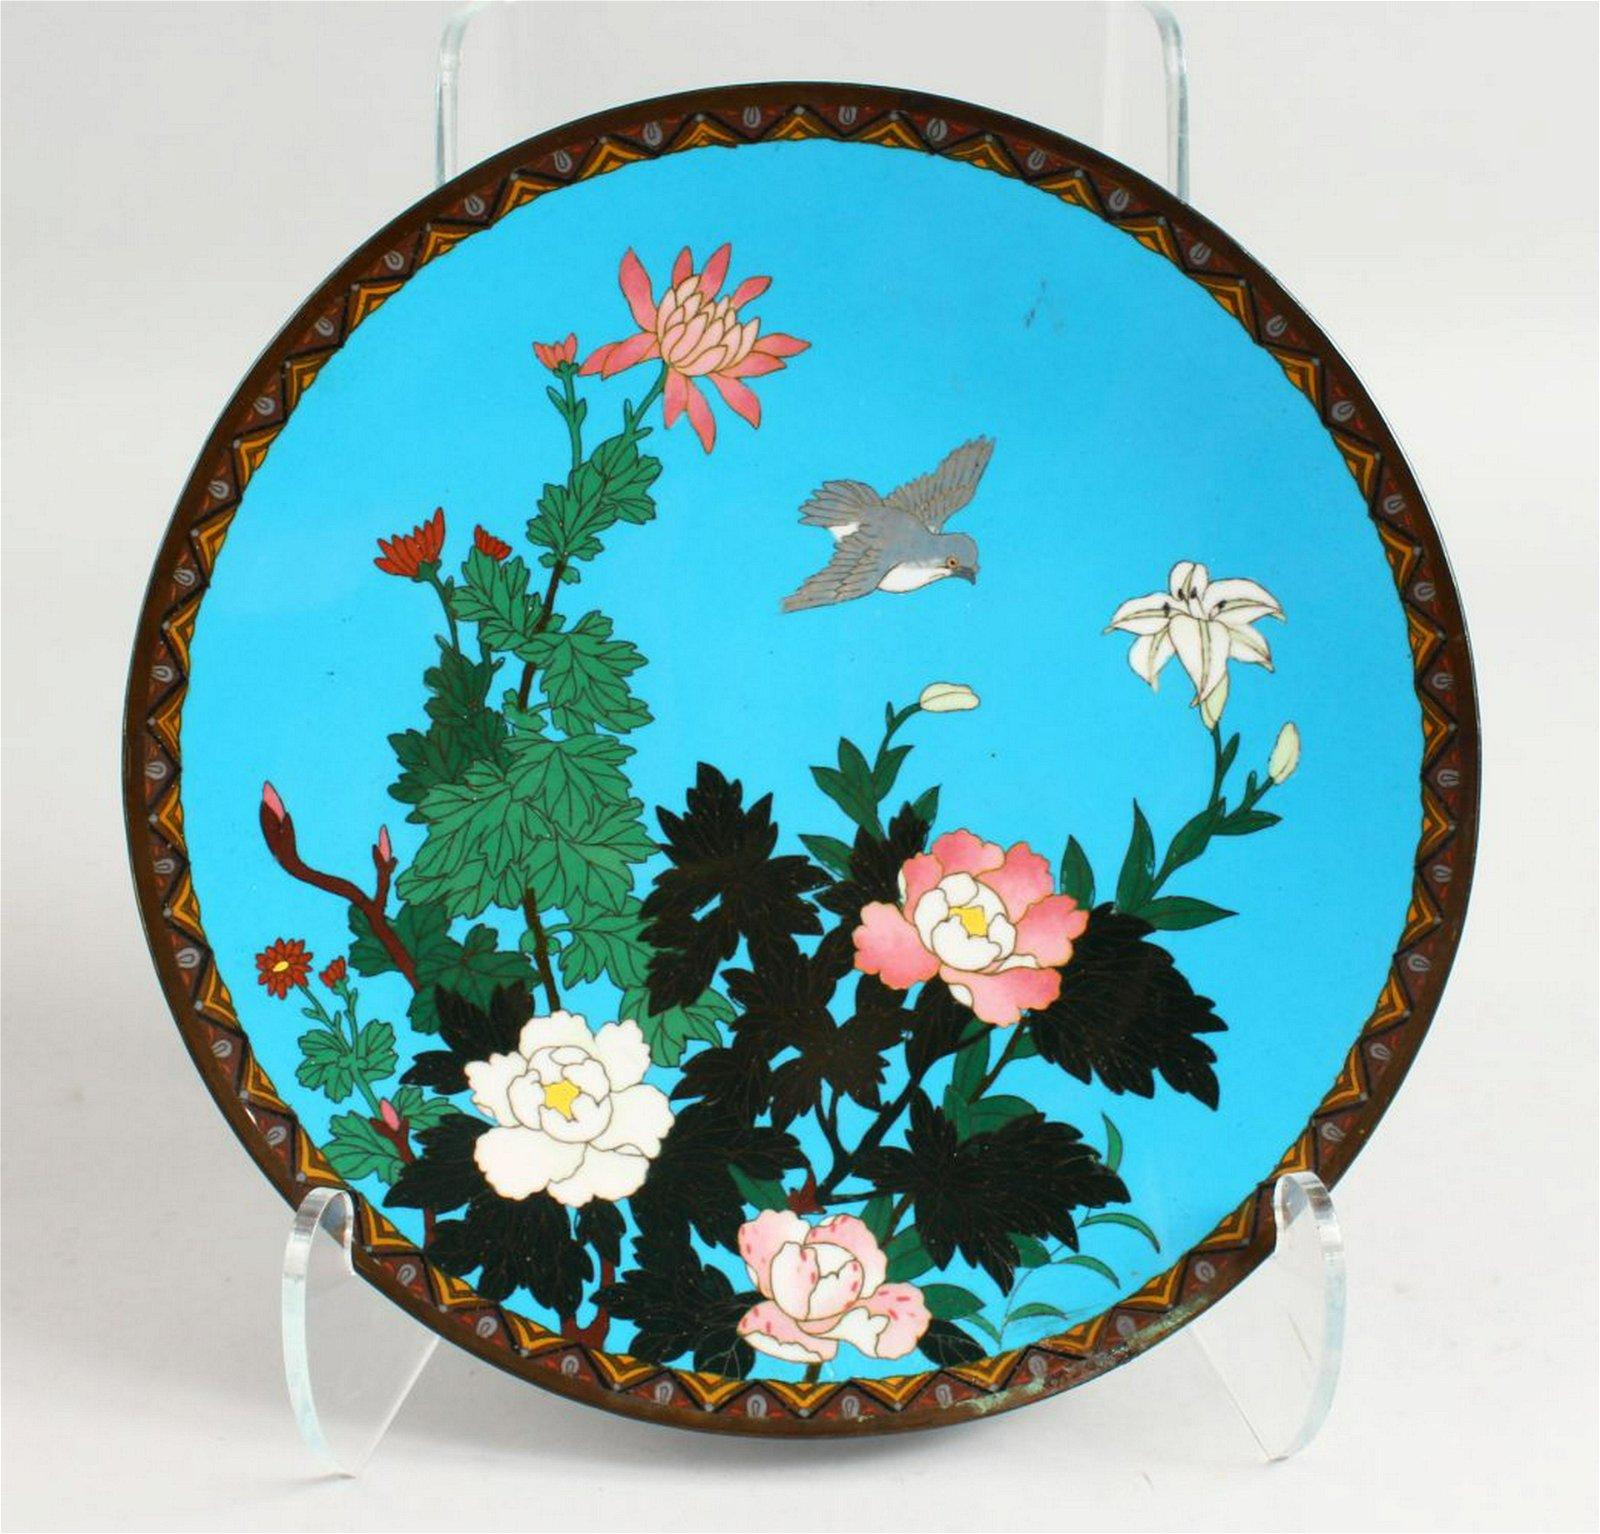 A 19TH CENTURY JAPANESE CLOISONNE ENAMEL DISH, blue